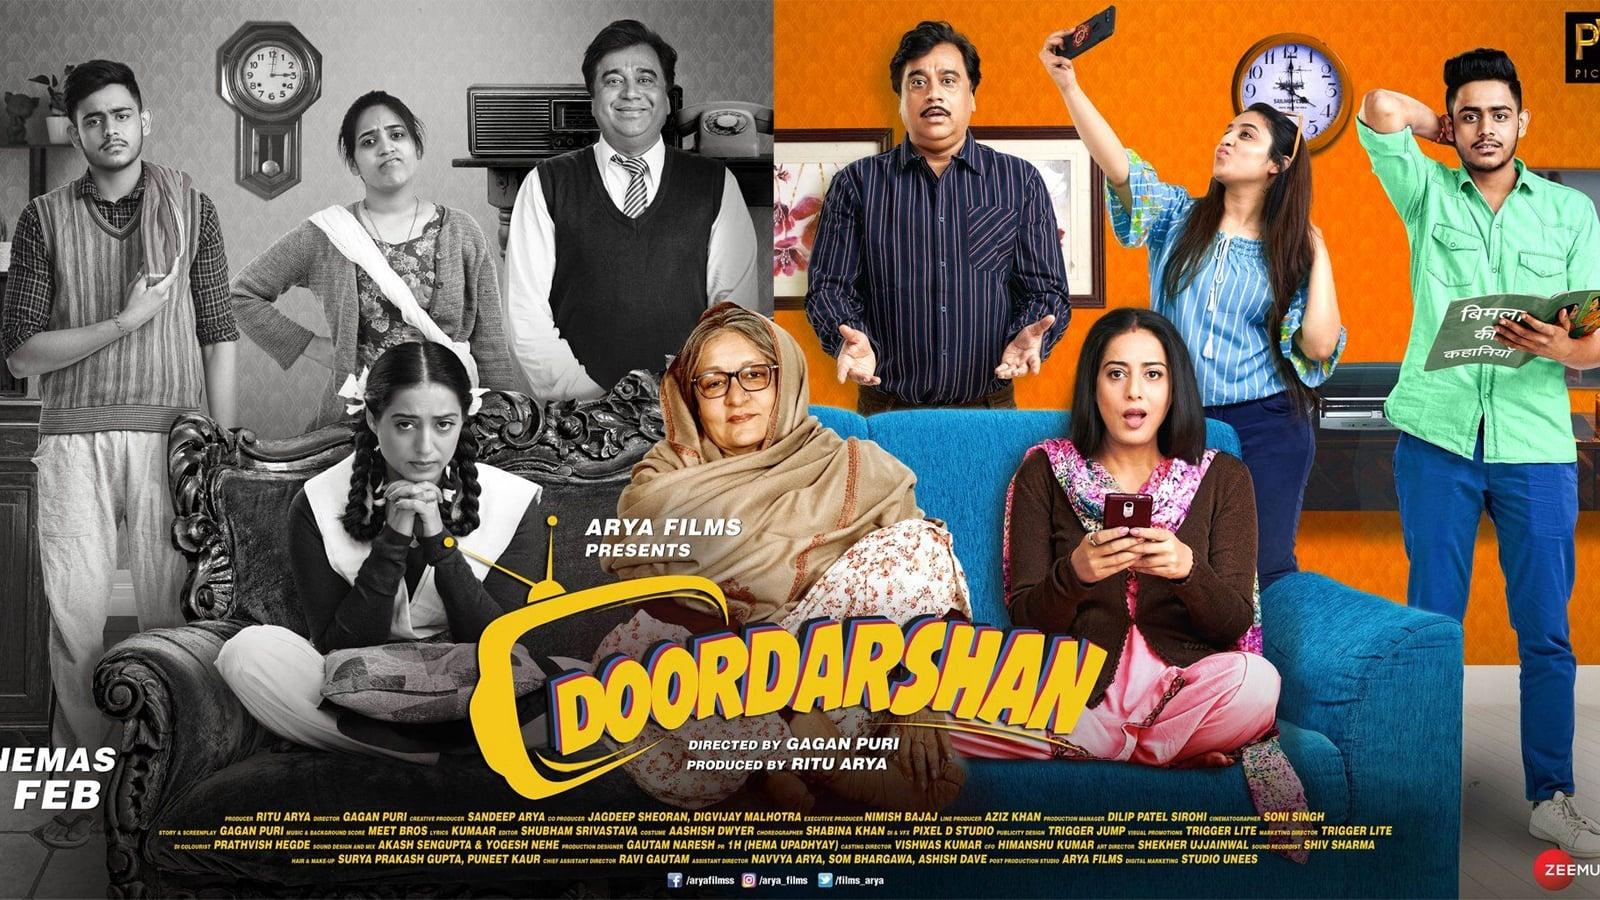 Doordarshan [2020]